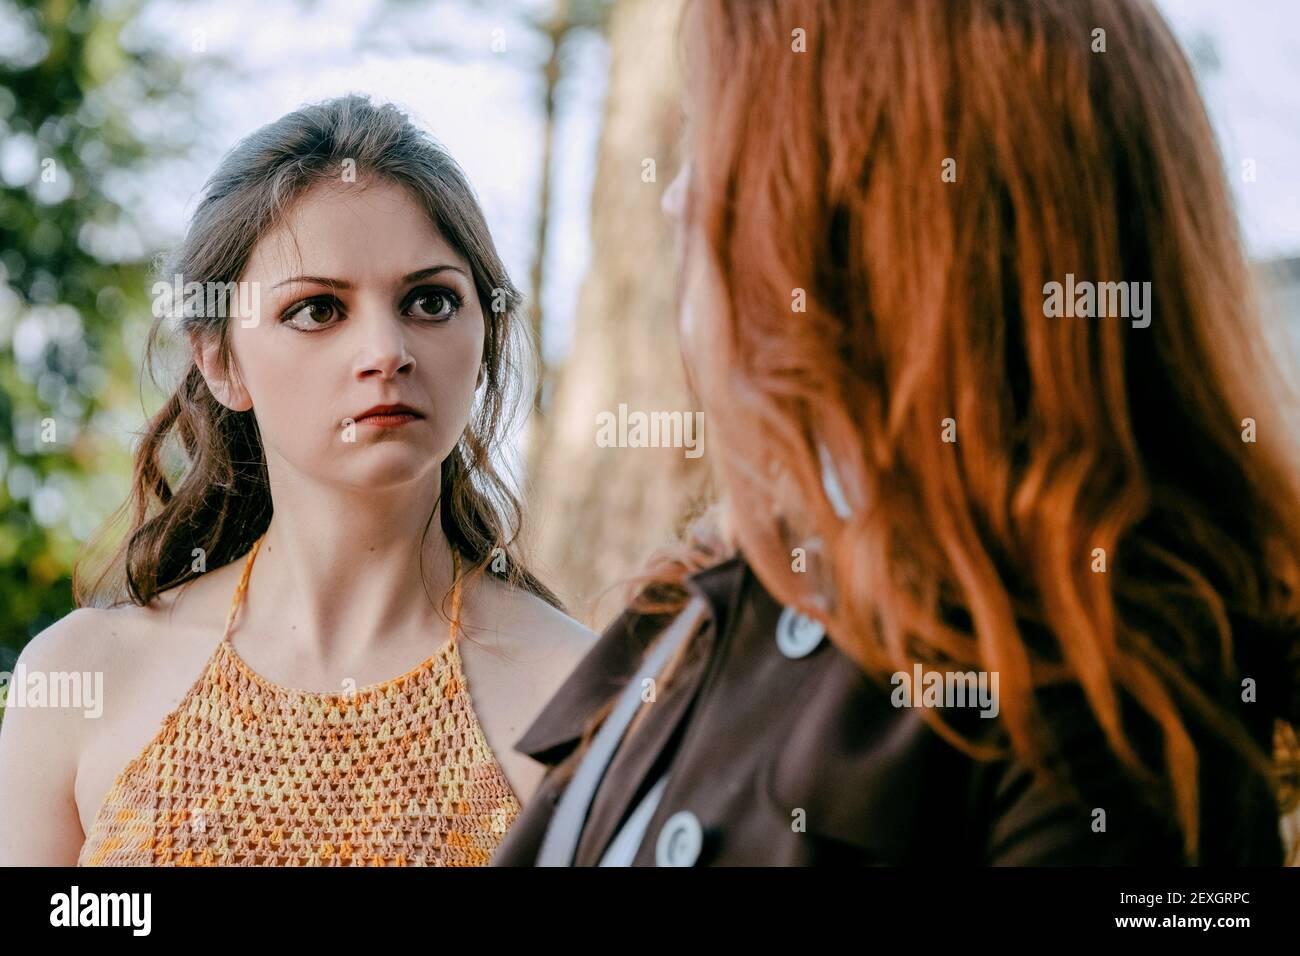 JESSICA CLEMENT, DARK ANGEL, 2019 Banque D'Images